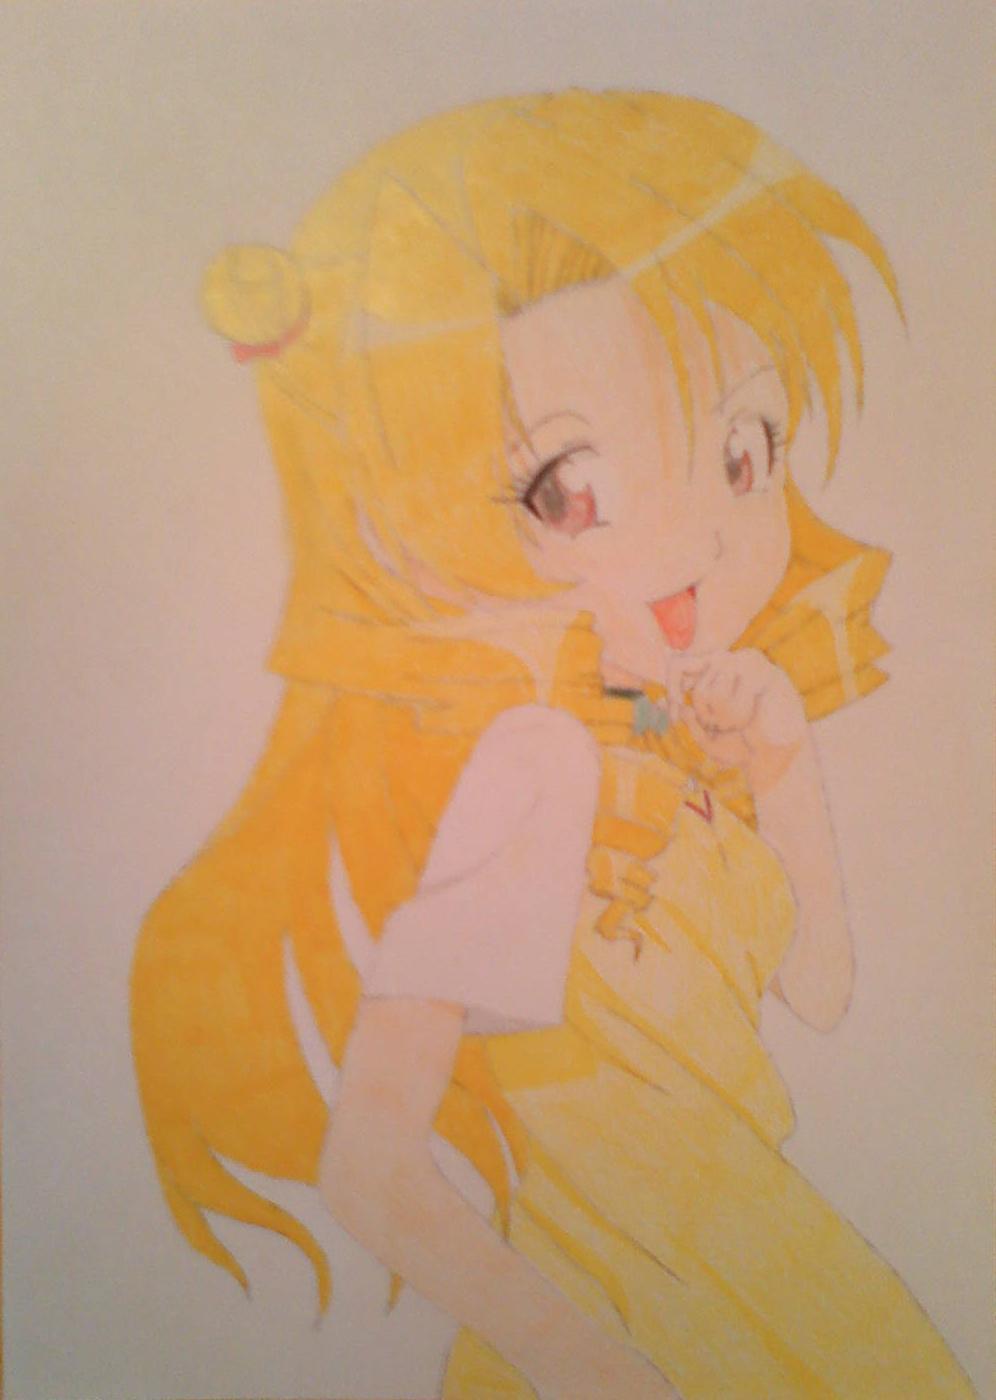 http://fc03.deviantart.net/fs50/f/2009/297/f/8/Saki_Tenjouin_by_arsinoe47.jpg